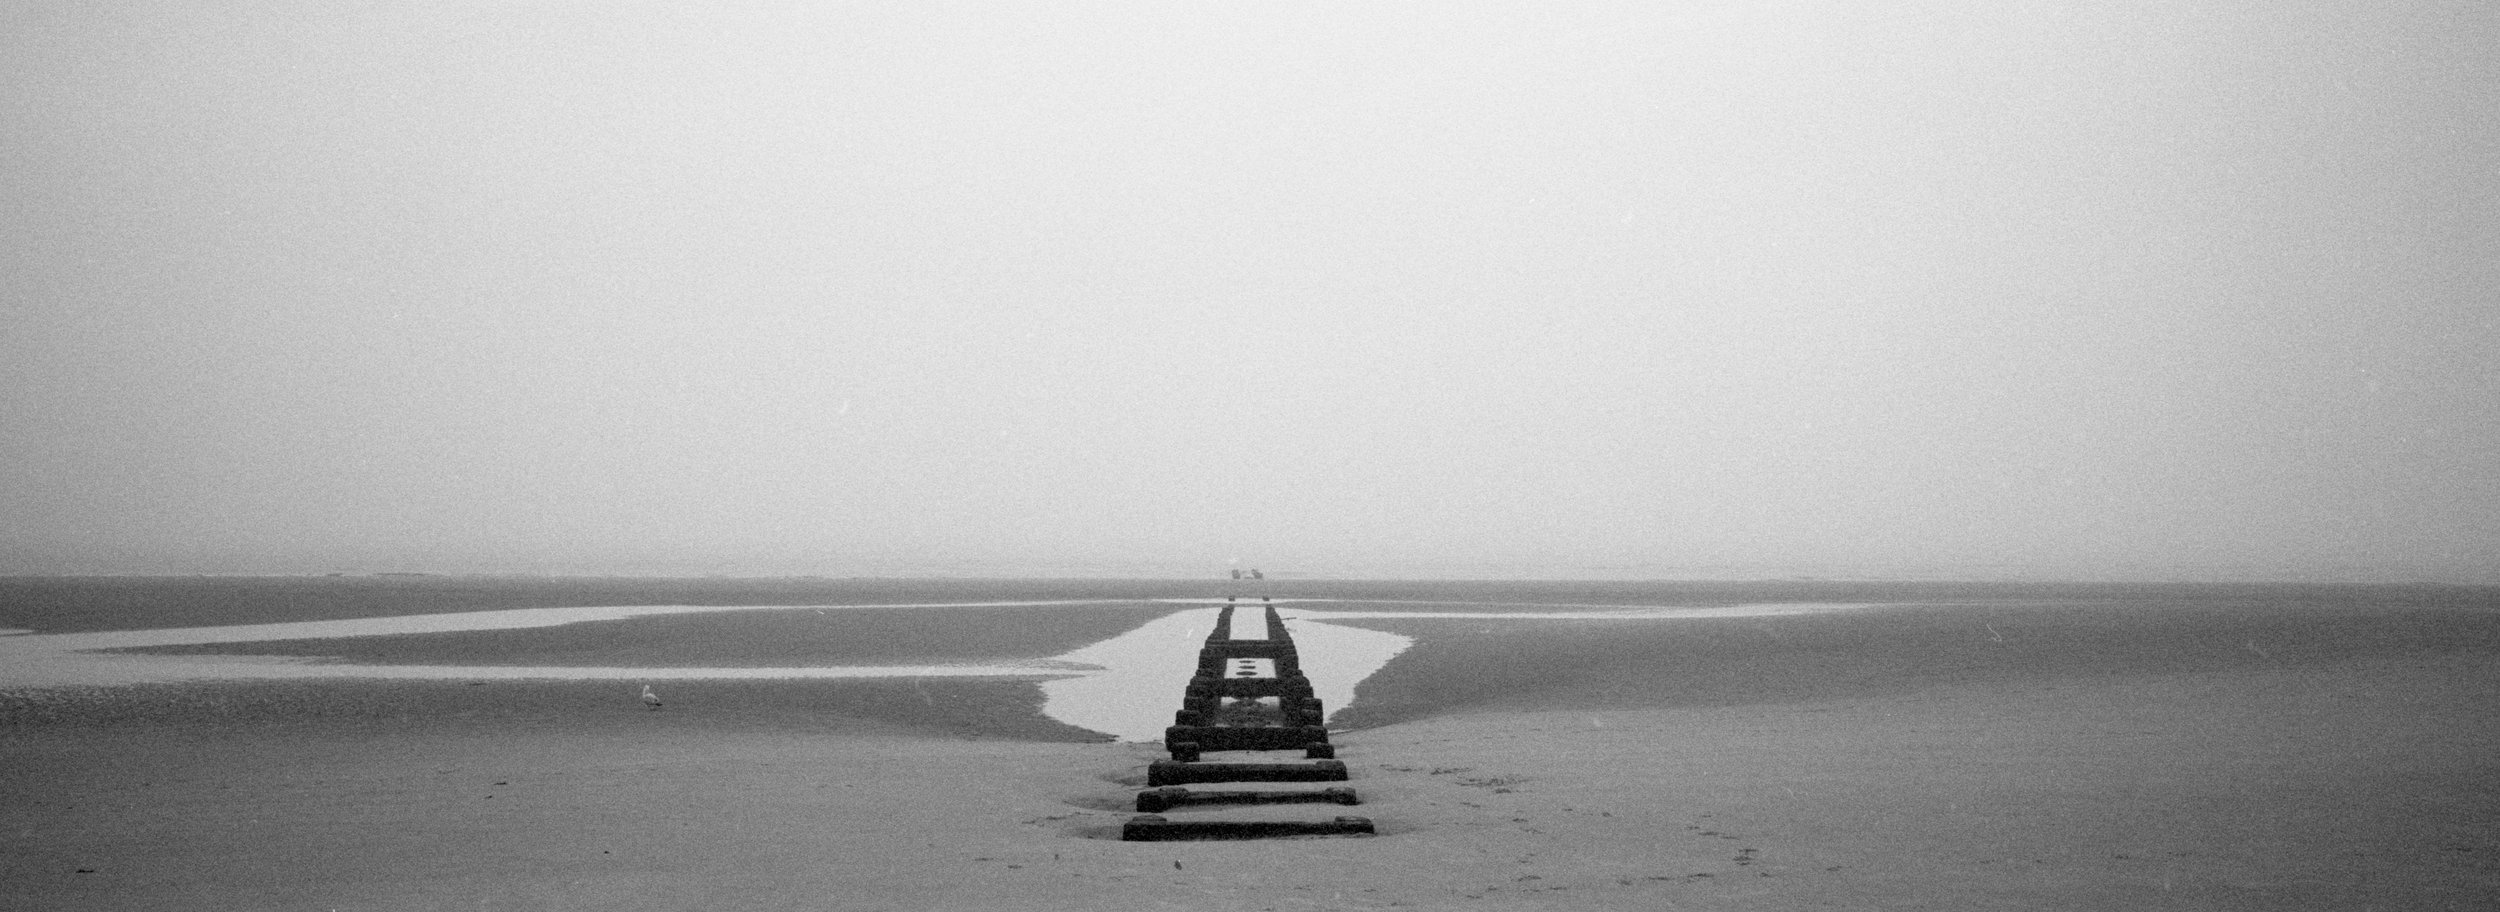 Landscape photography-6.jpg